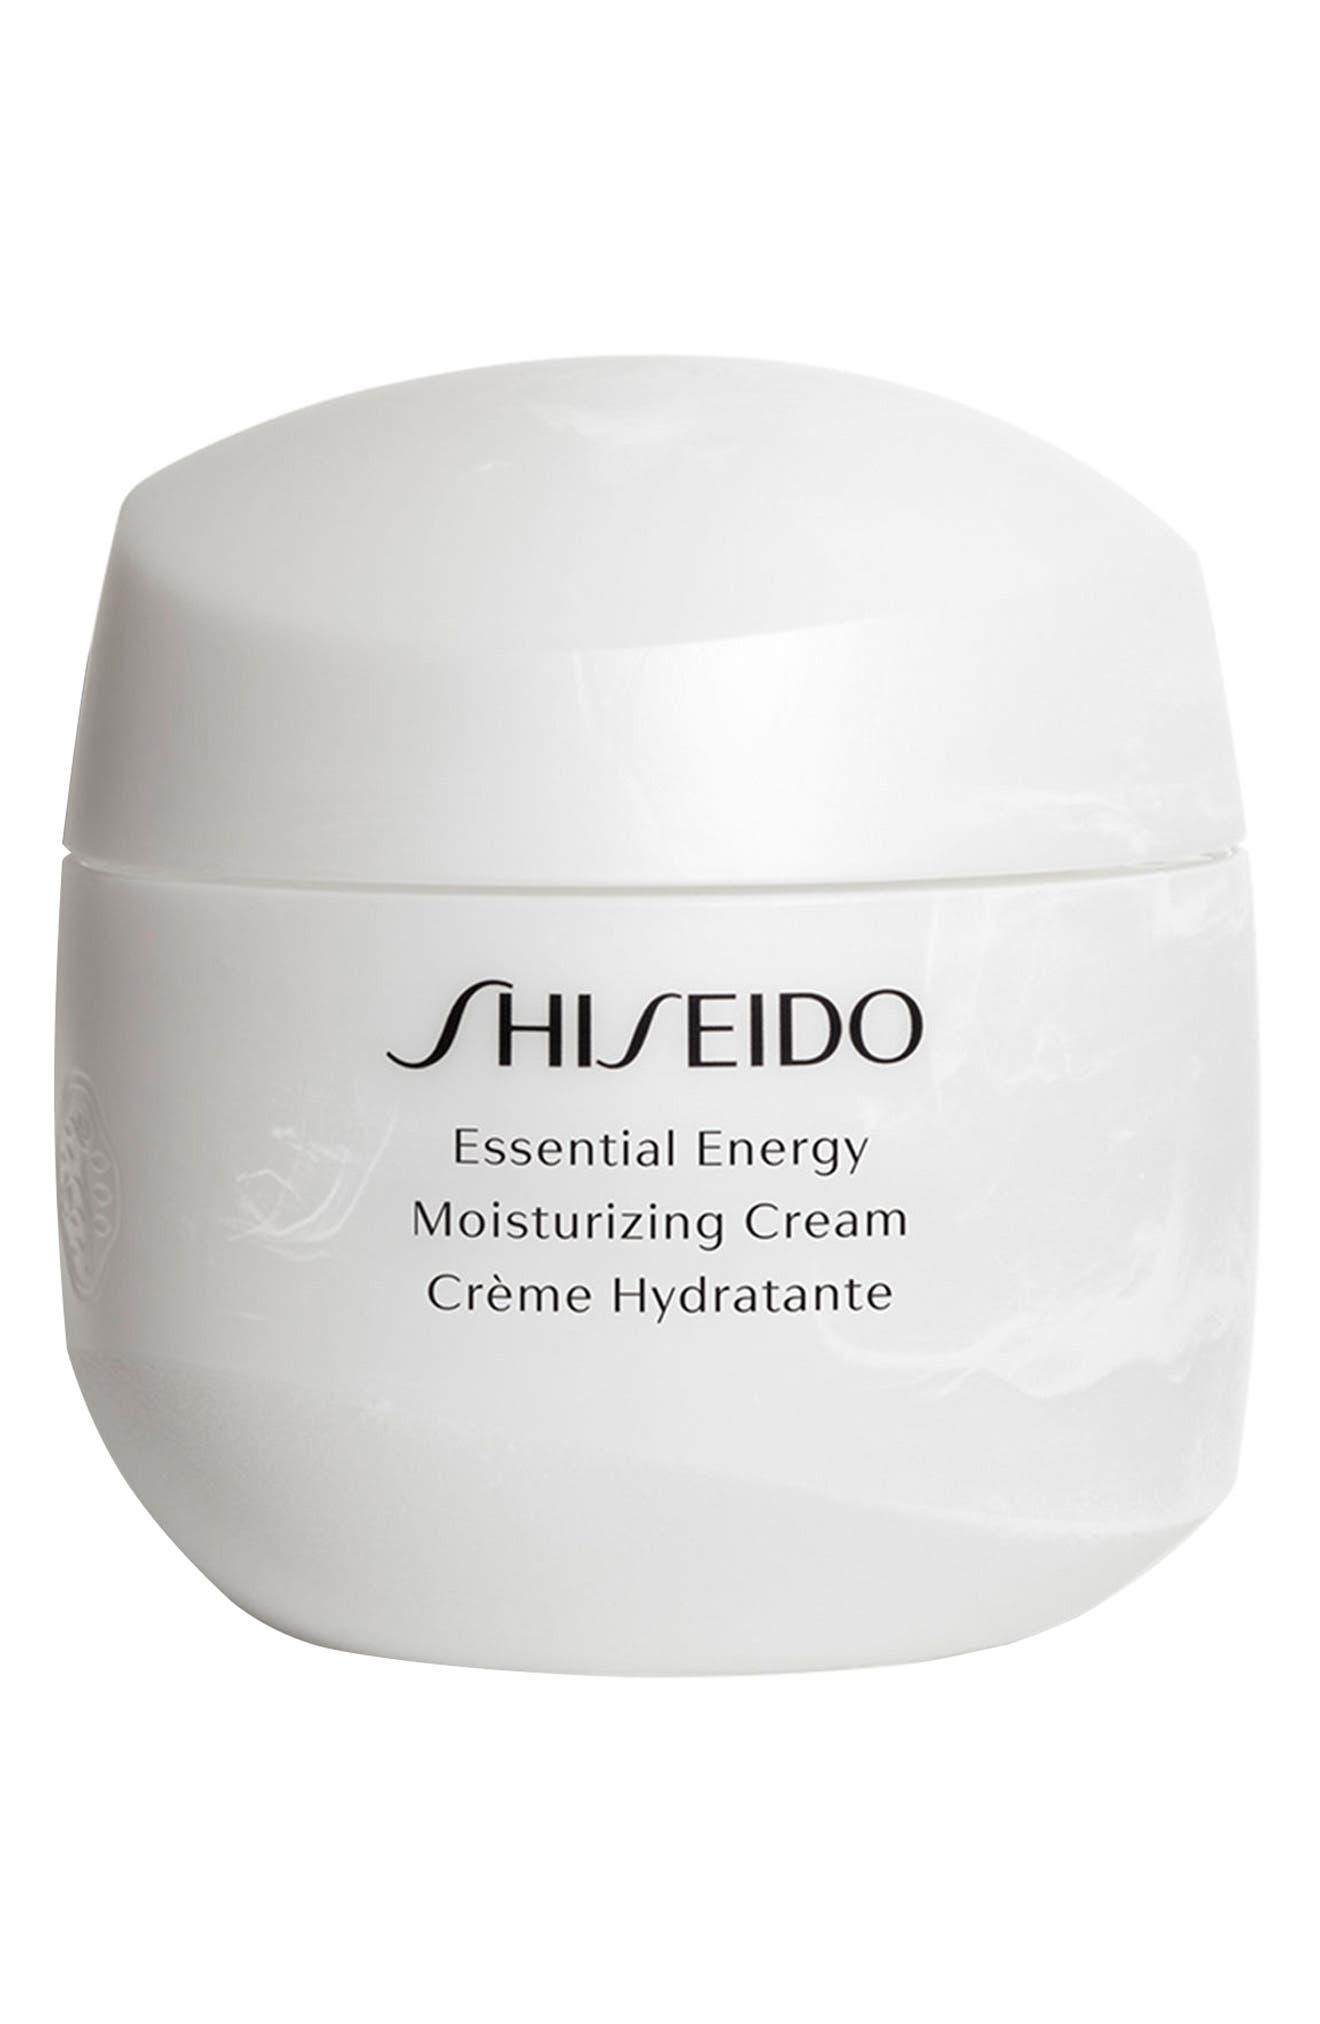 Essential Energy Moisturizing Cream,                             Main thumbnail 1, color,                             NO COLOR